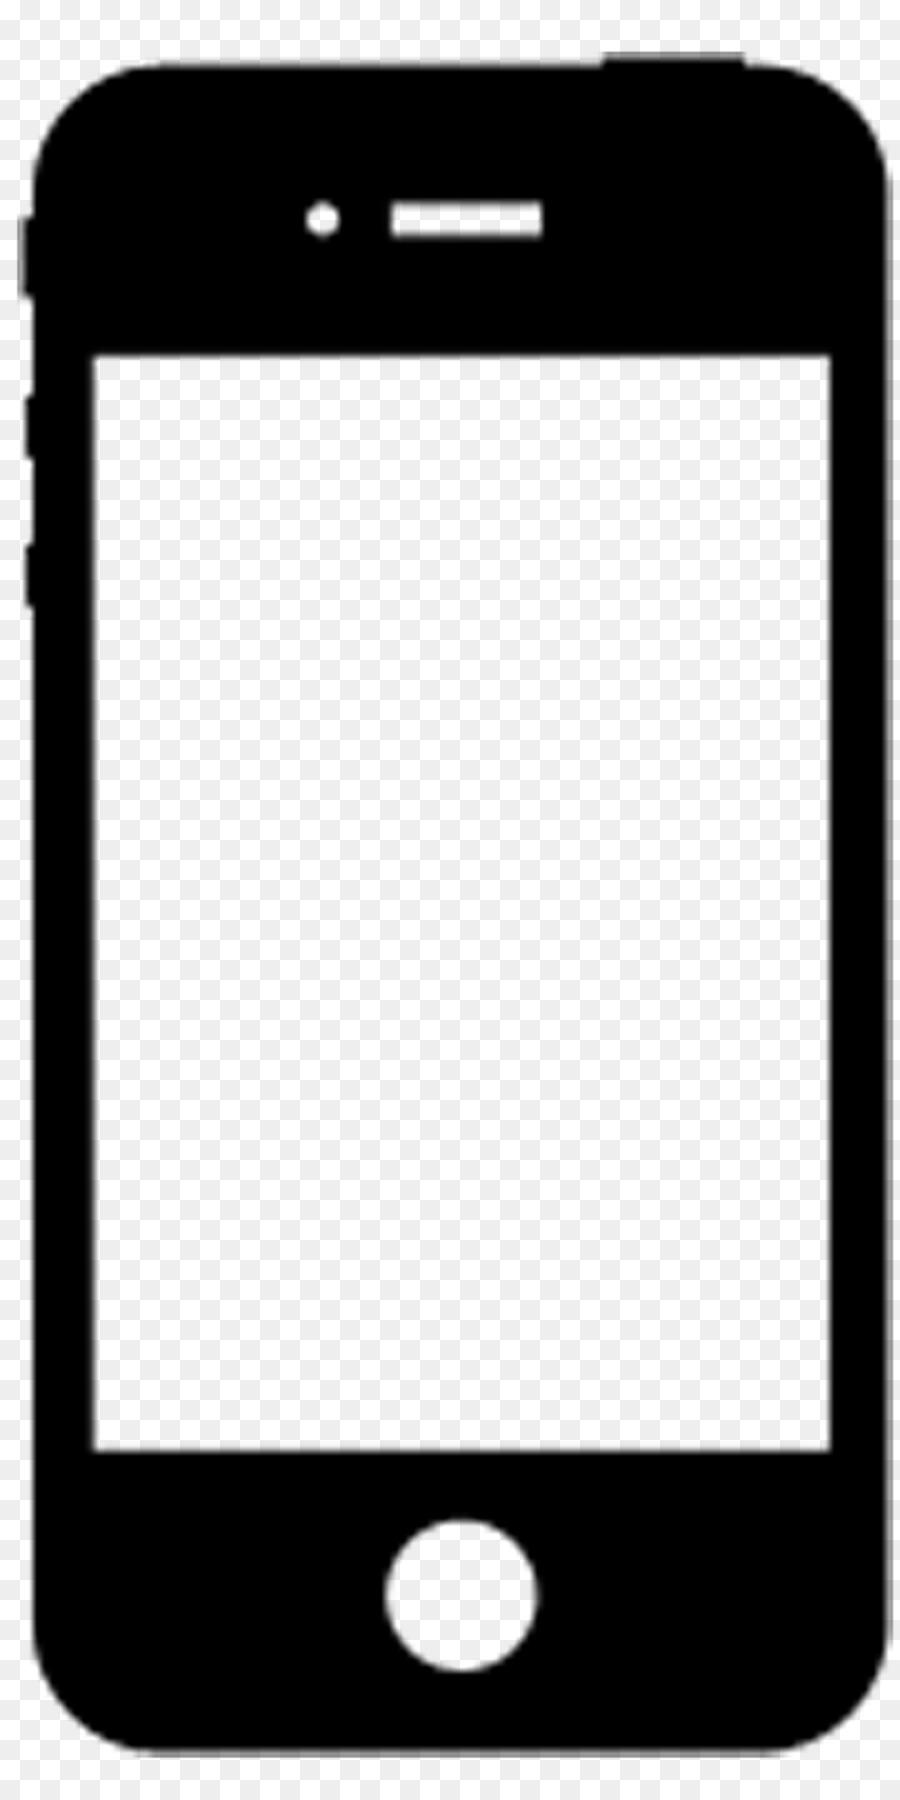 900x1800 Iphone Smartphone Telephone Clip Art